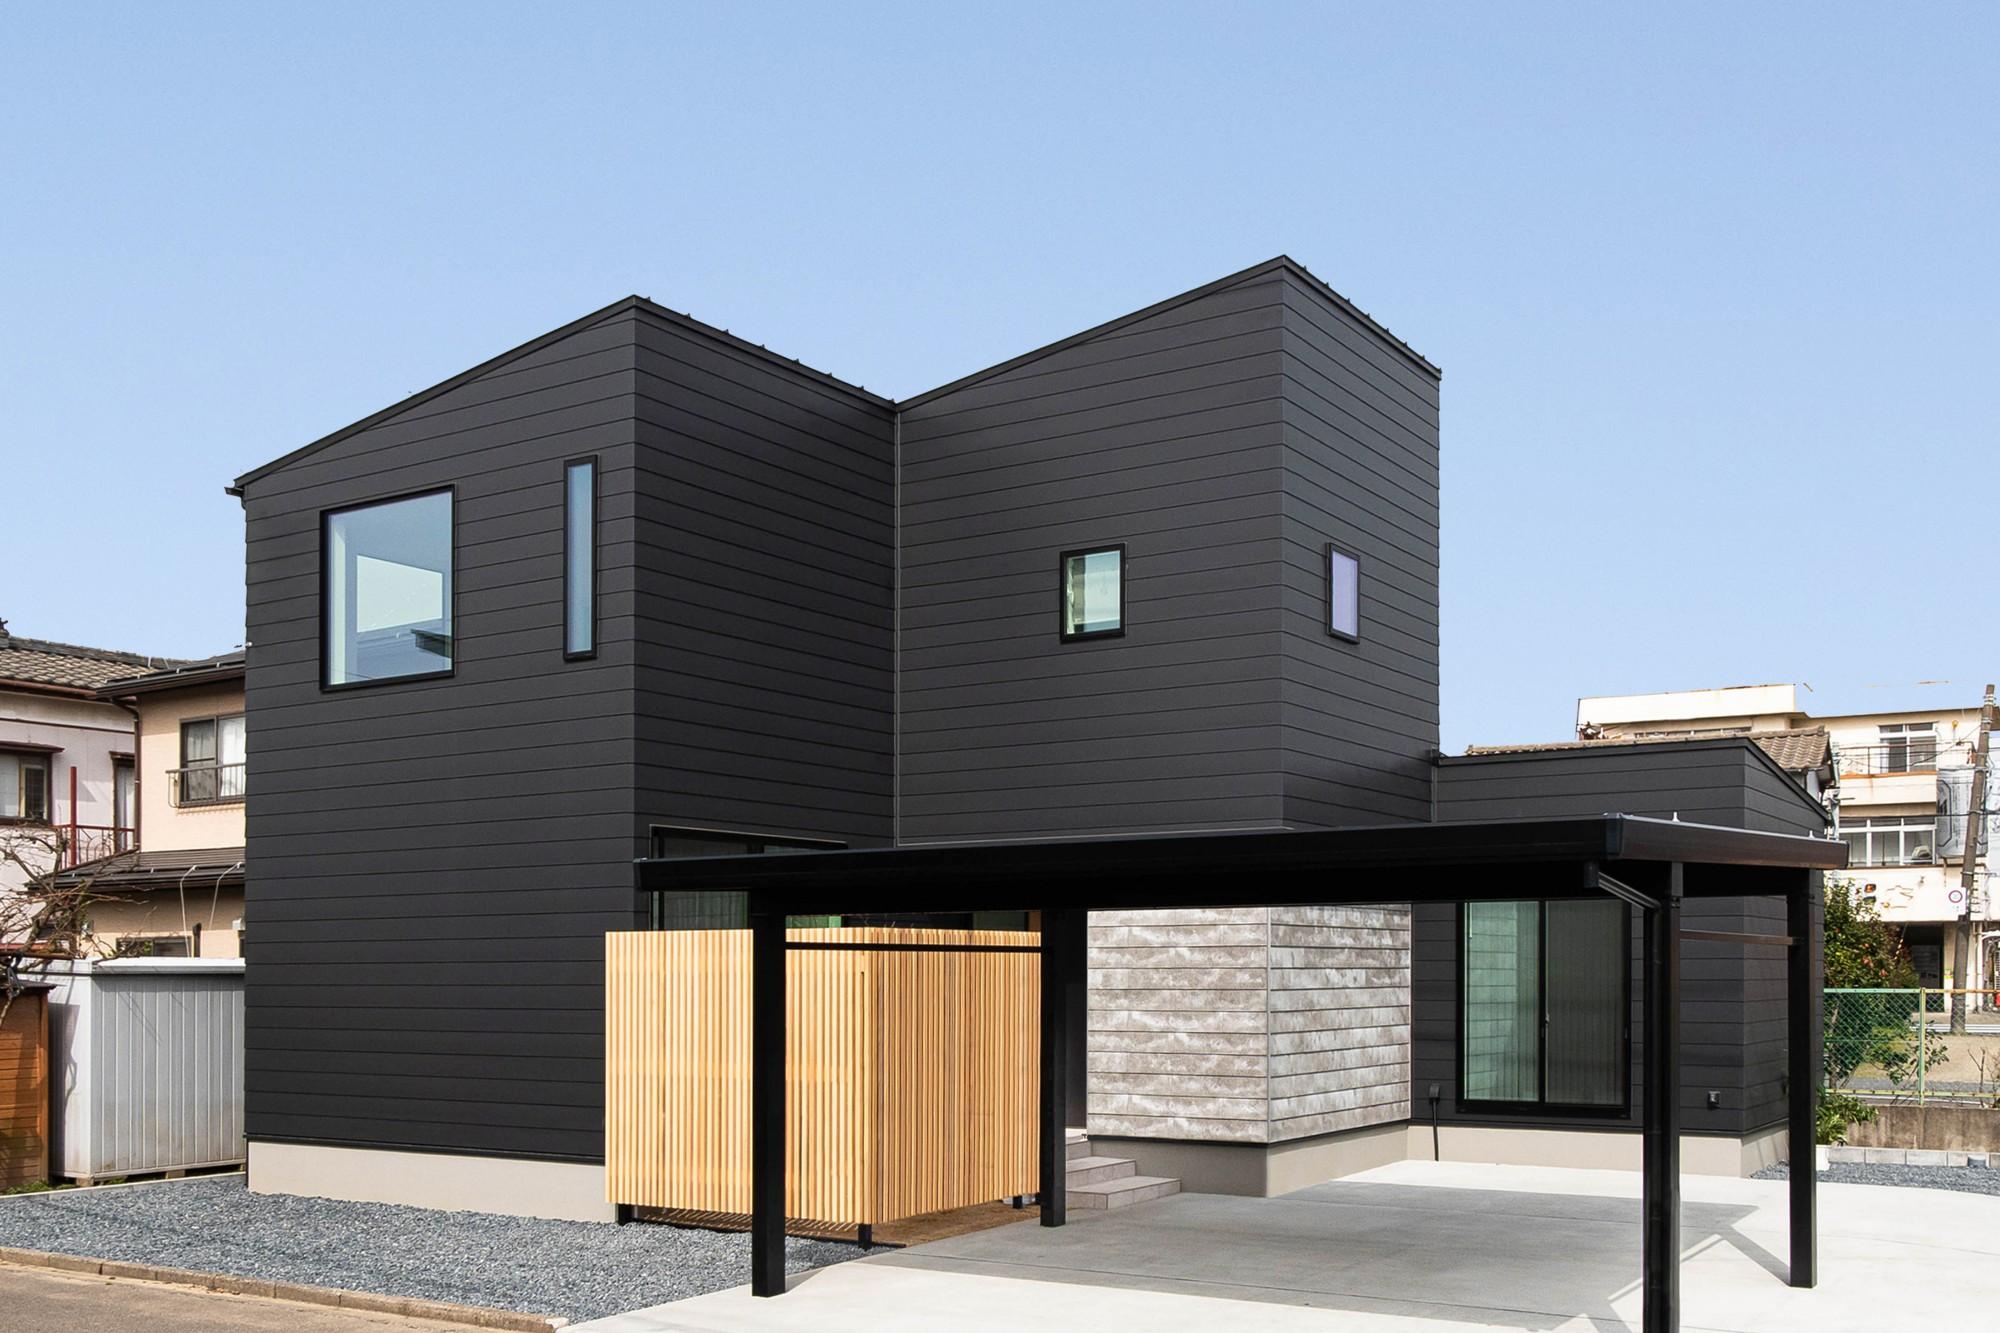 DETAIL HOME(ディテールホーム)「縦横の広がりをつくる、ツリーと吹抜けのある家」のシンプル・ナチュラルな外観の実例写真